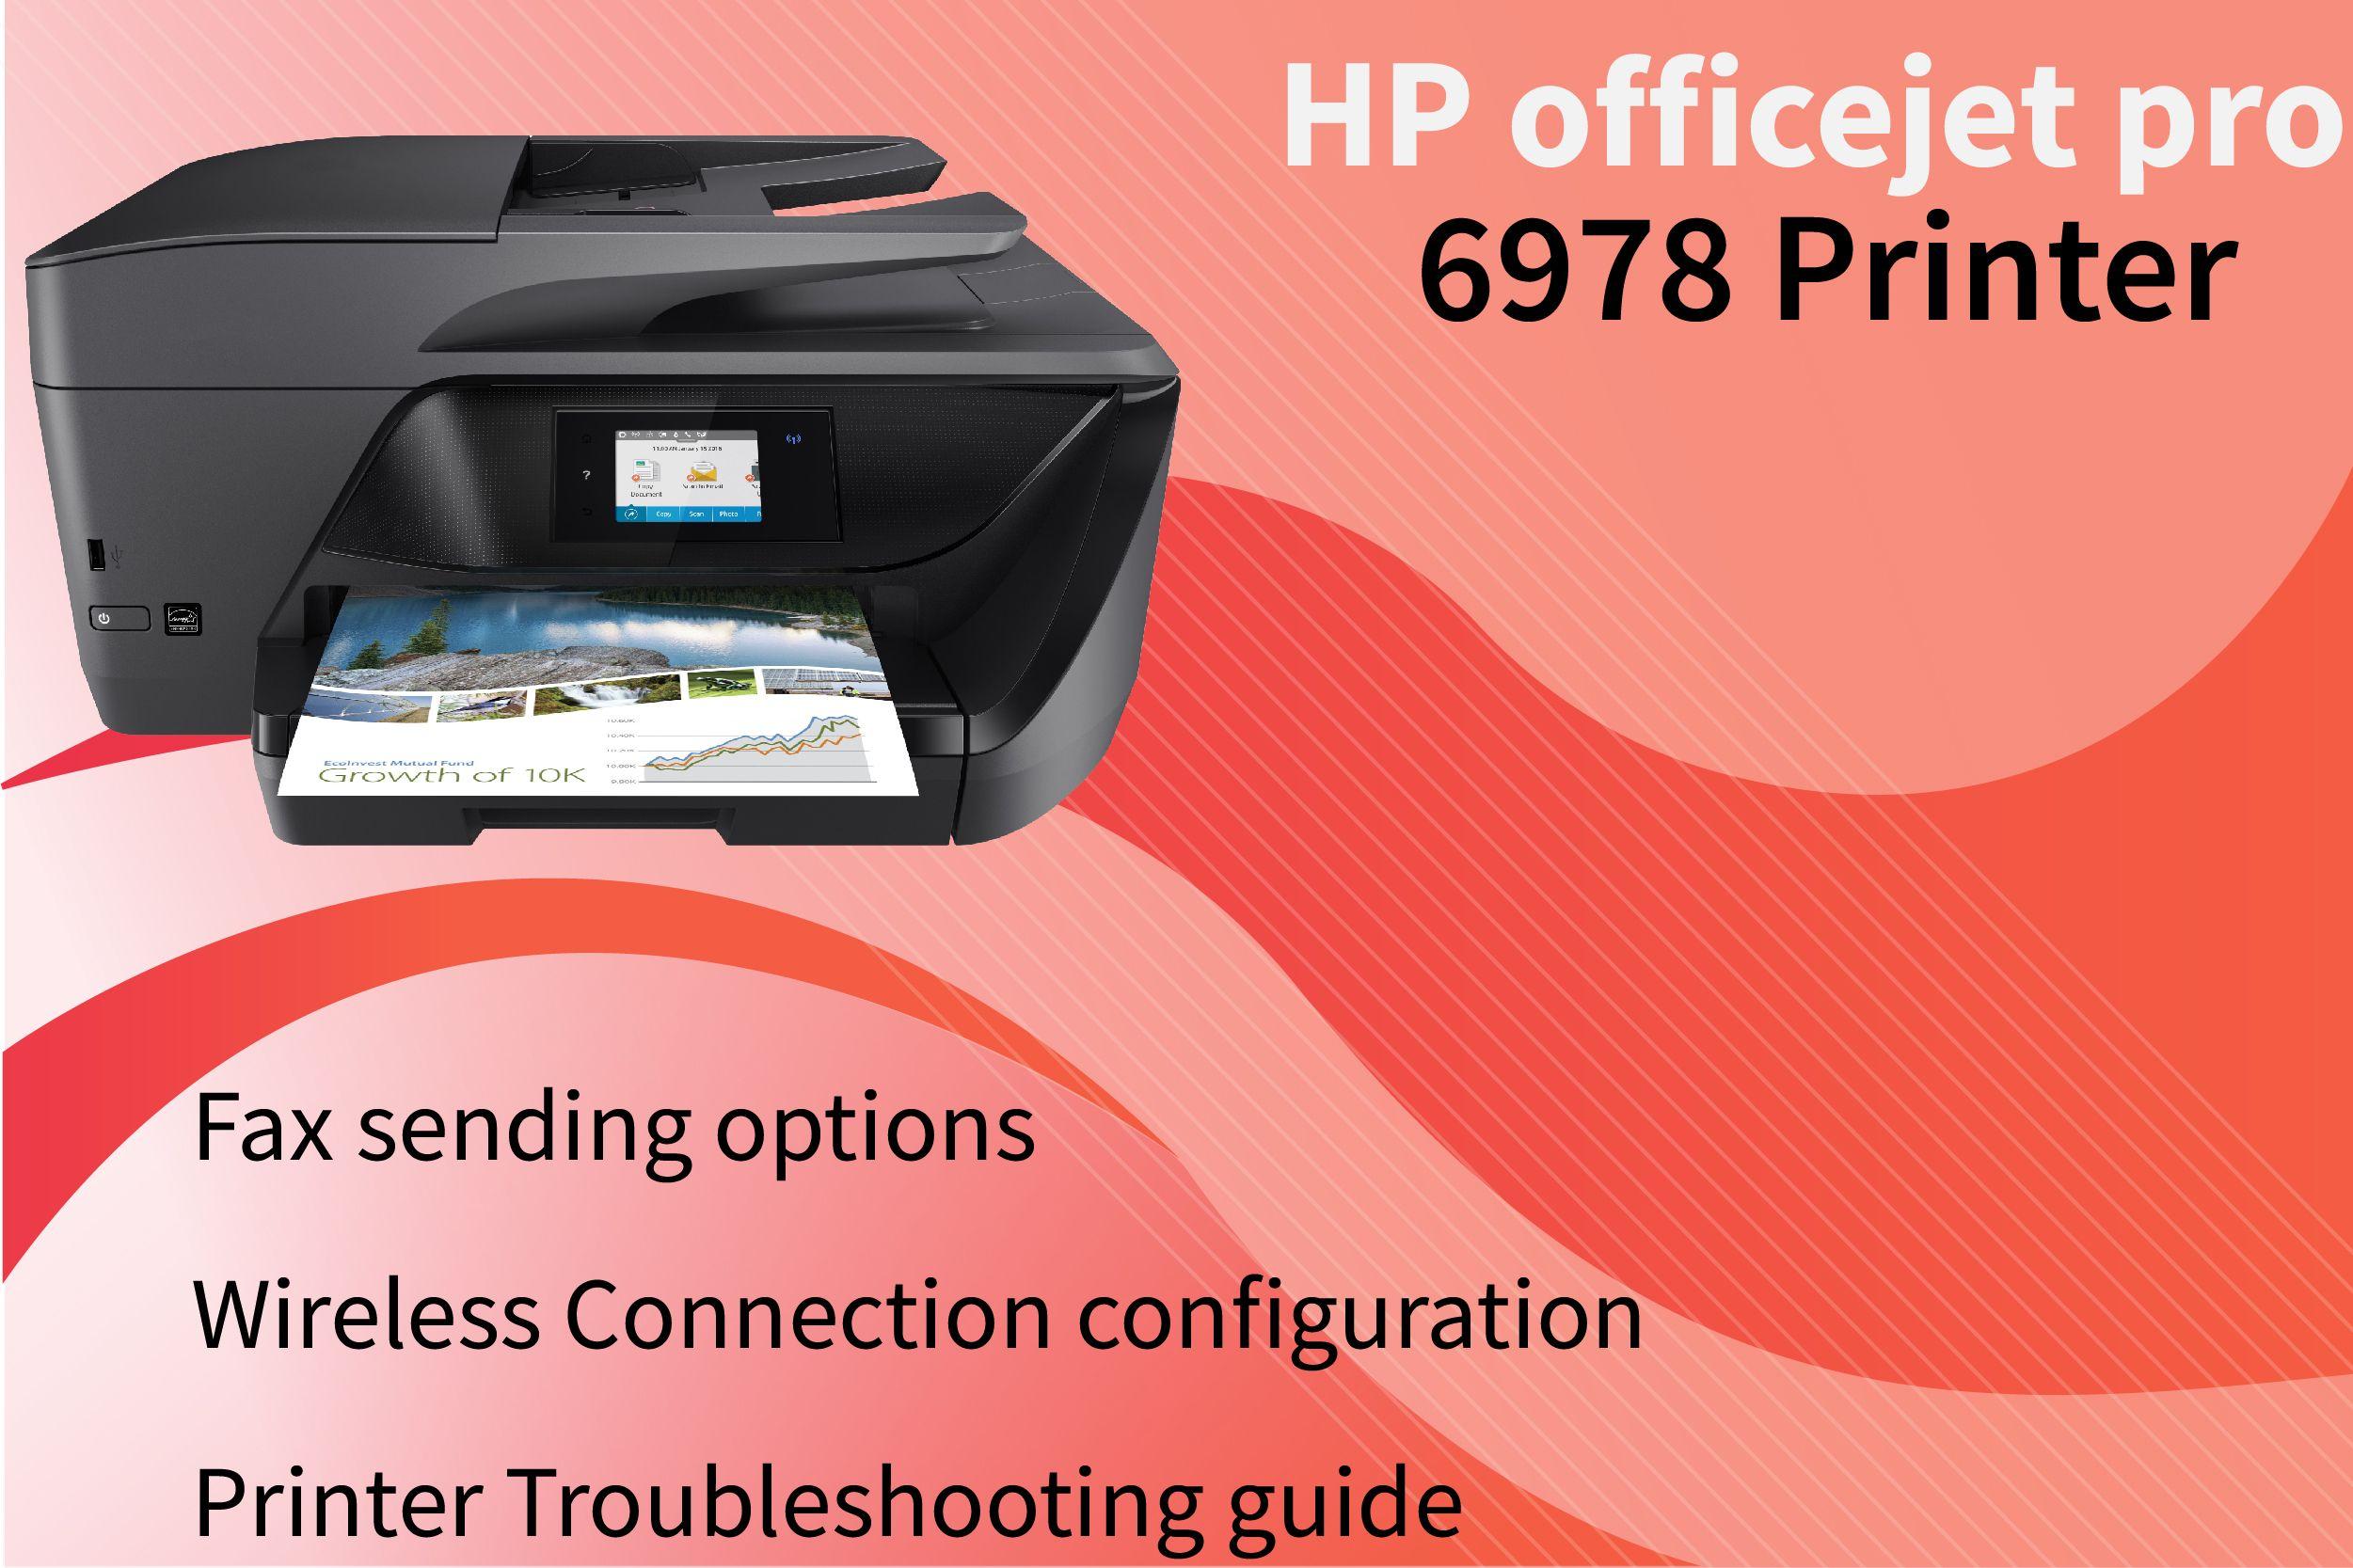 123 hp com/ojpro6978 | HP Officejet Pro Printer | Hp